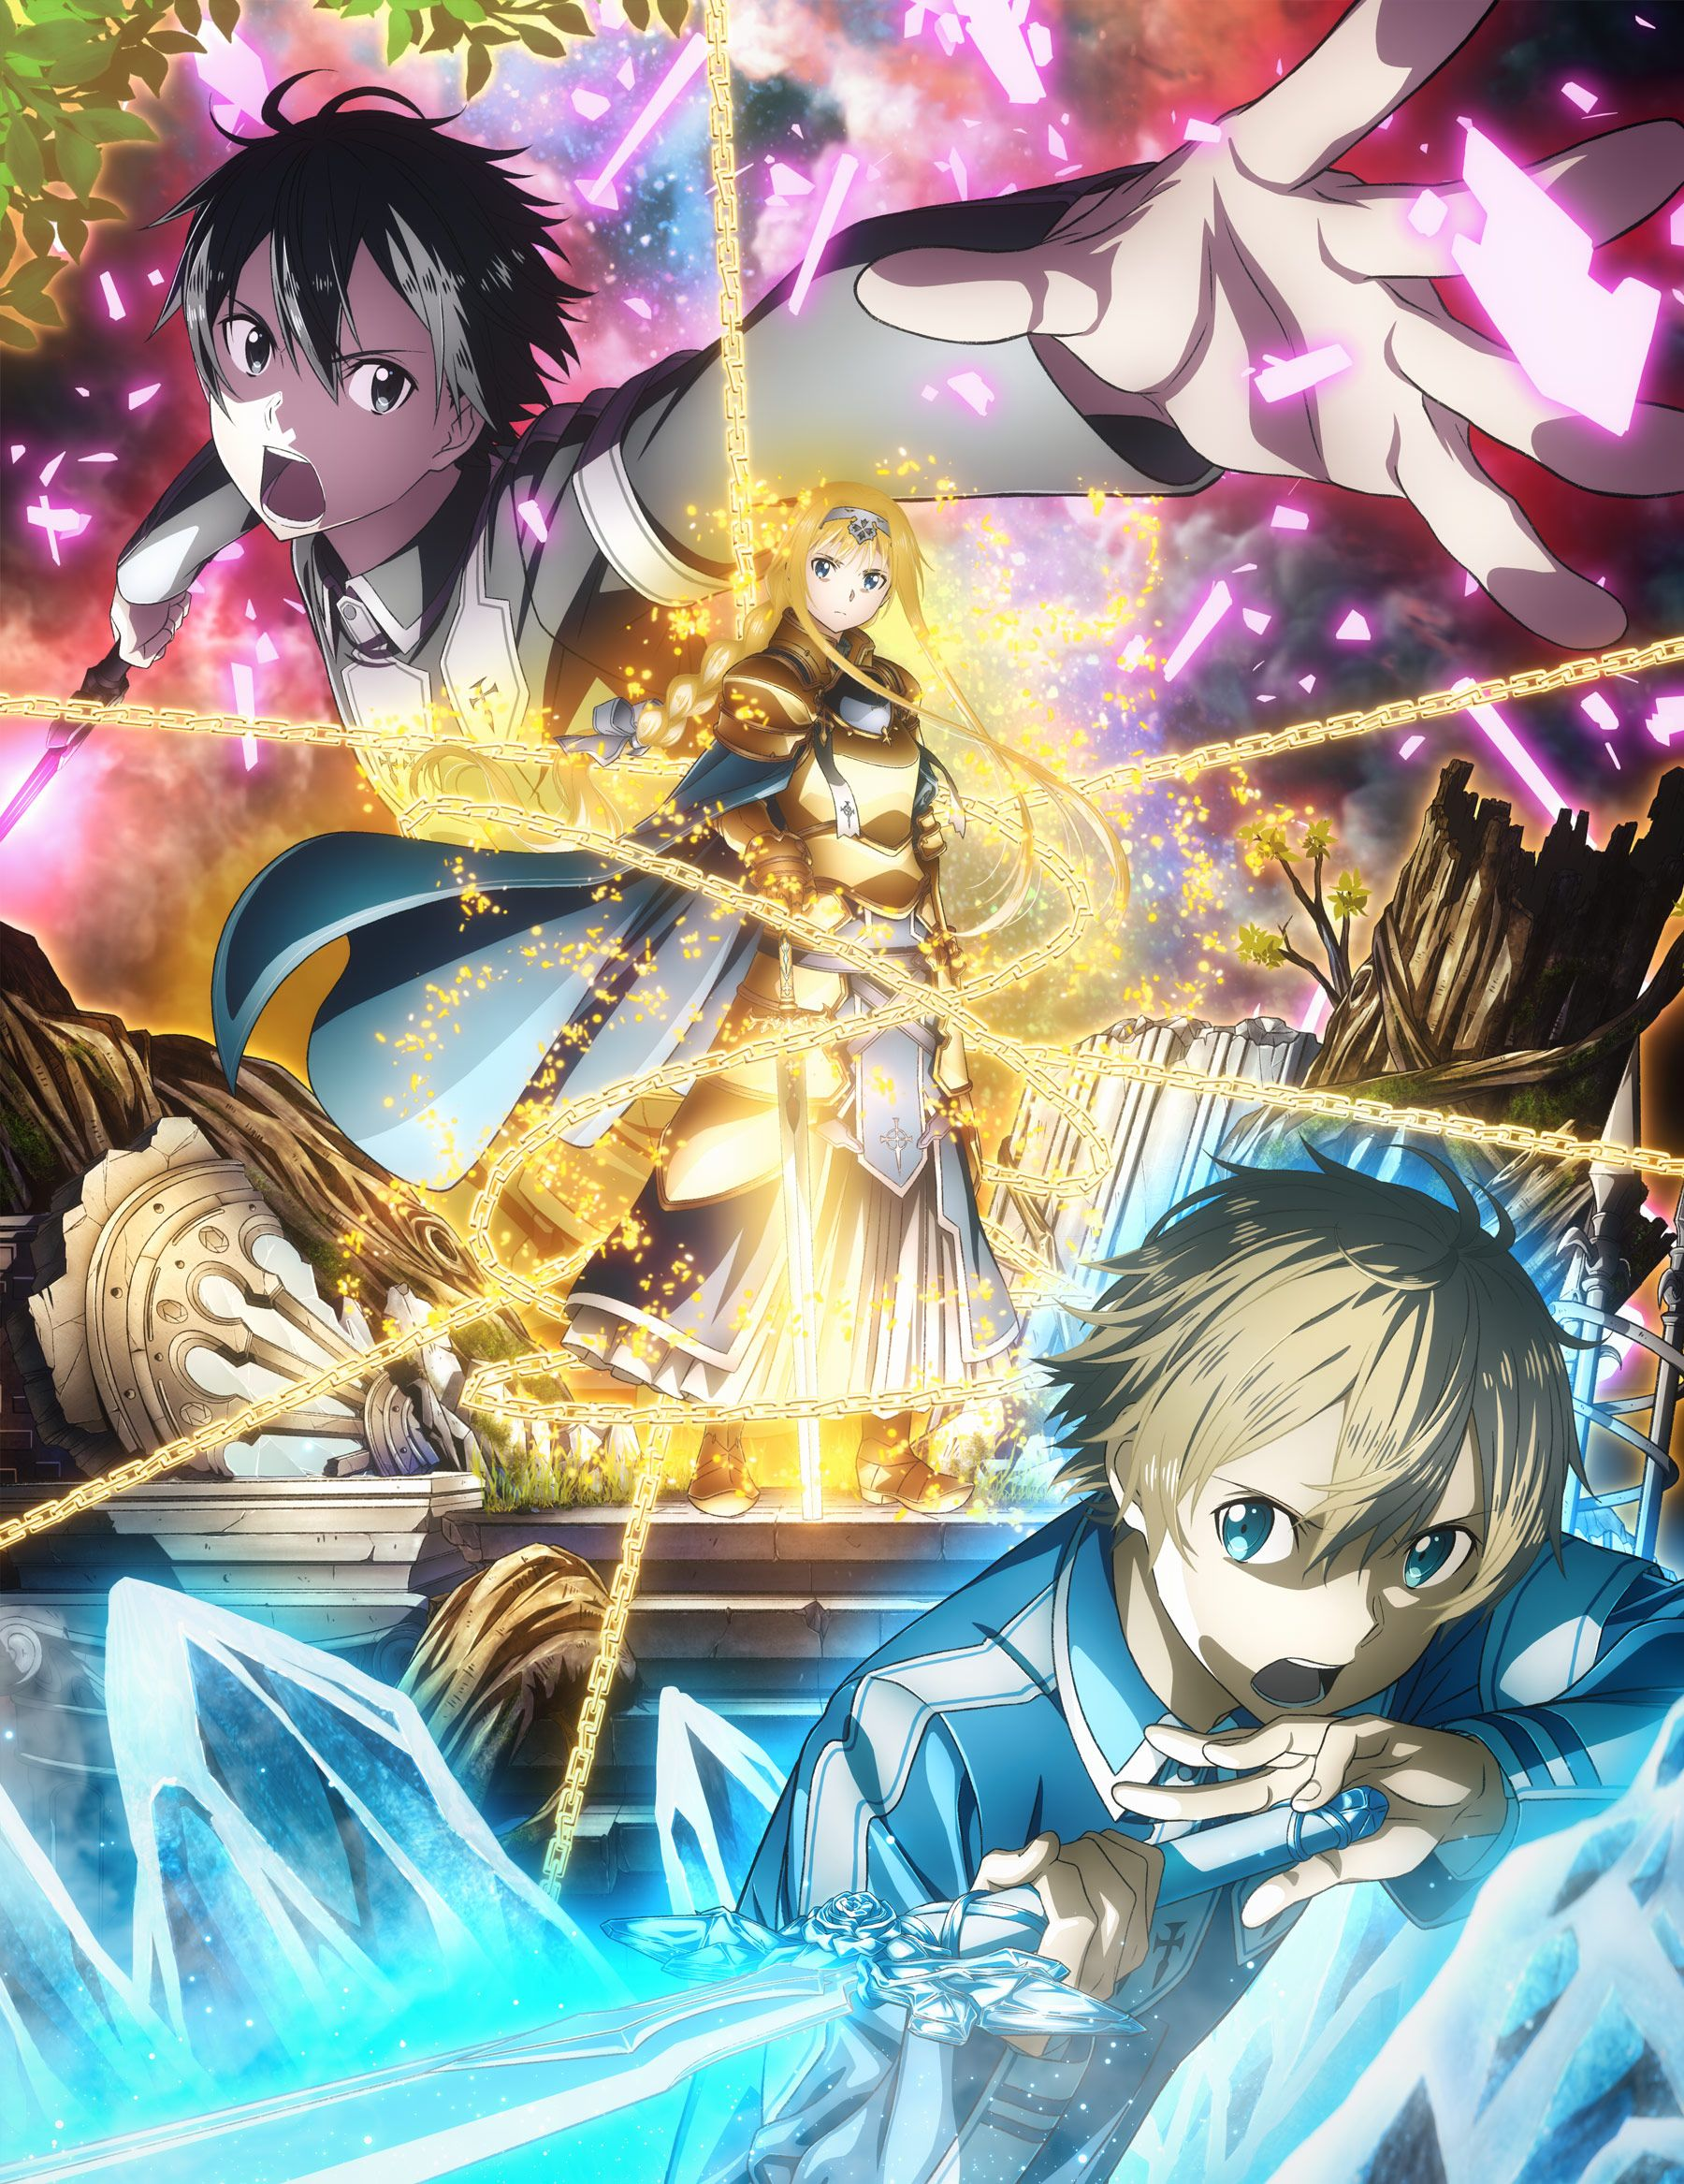 「Sword Art Online」おしゃれまとめの人気アイデア|Pinterest|Atenience